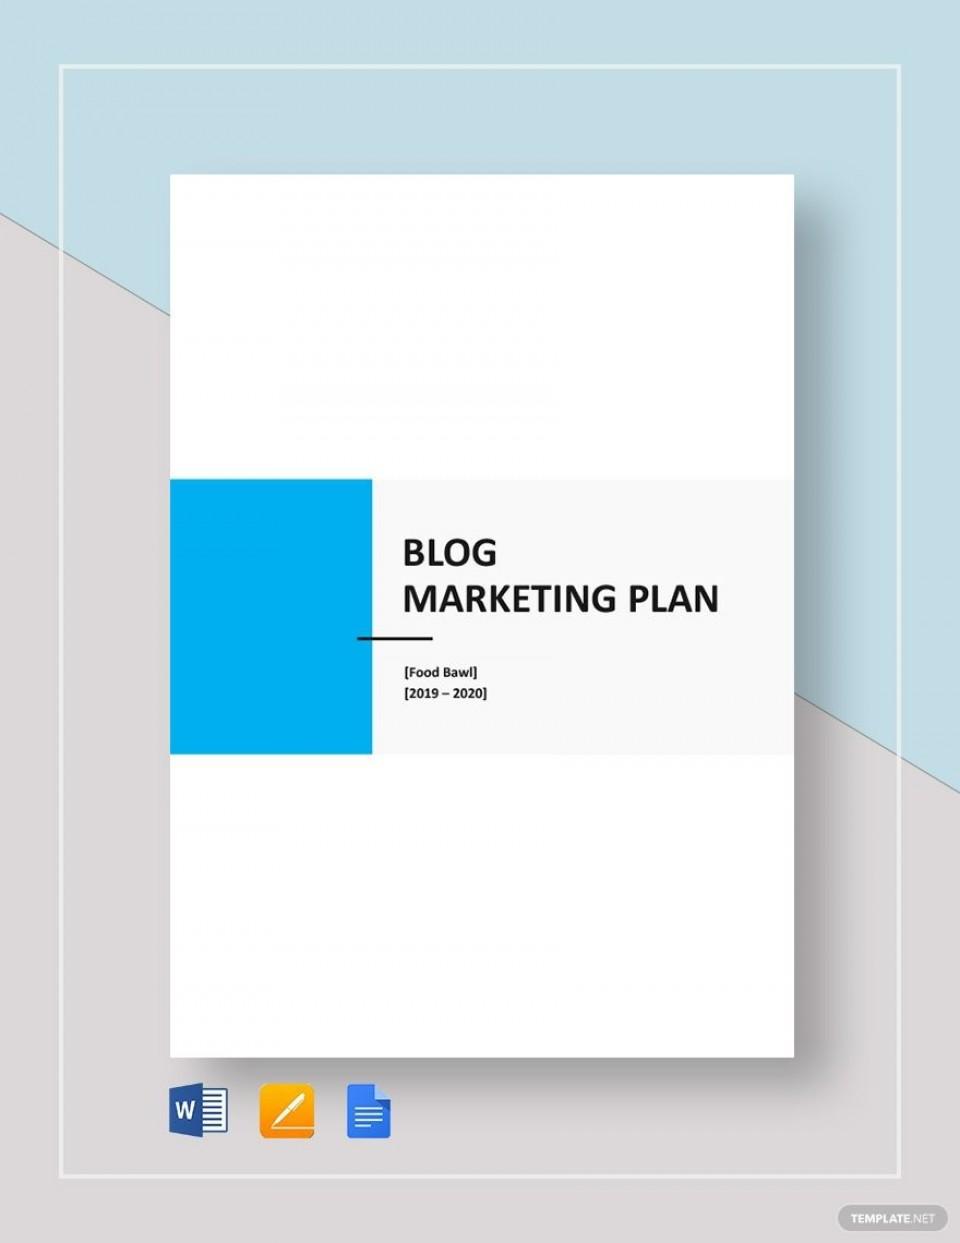 009 Excellent Social Media Marketing Plan Template Doc Idea 960